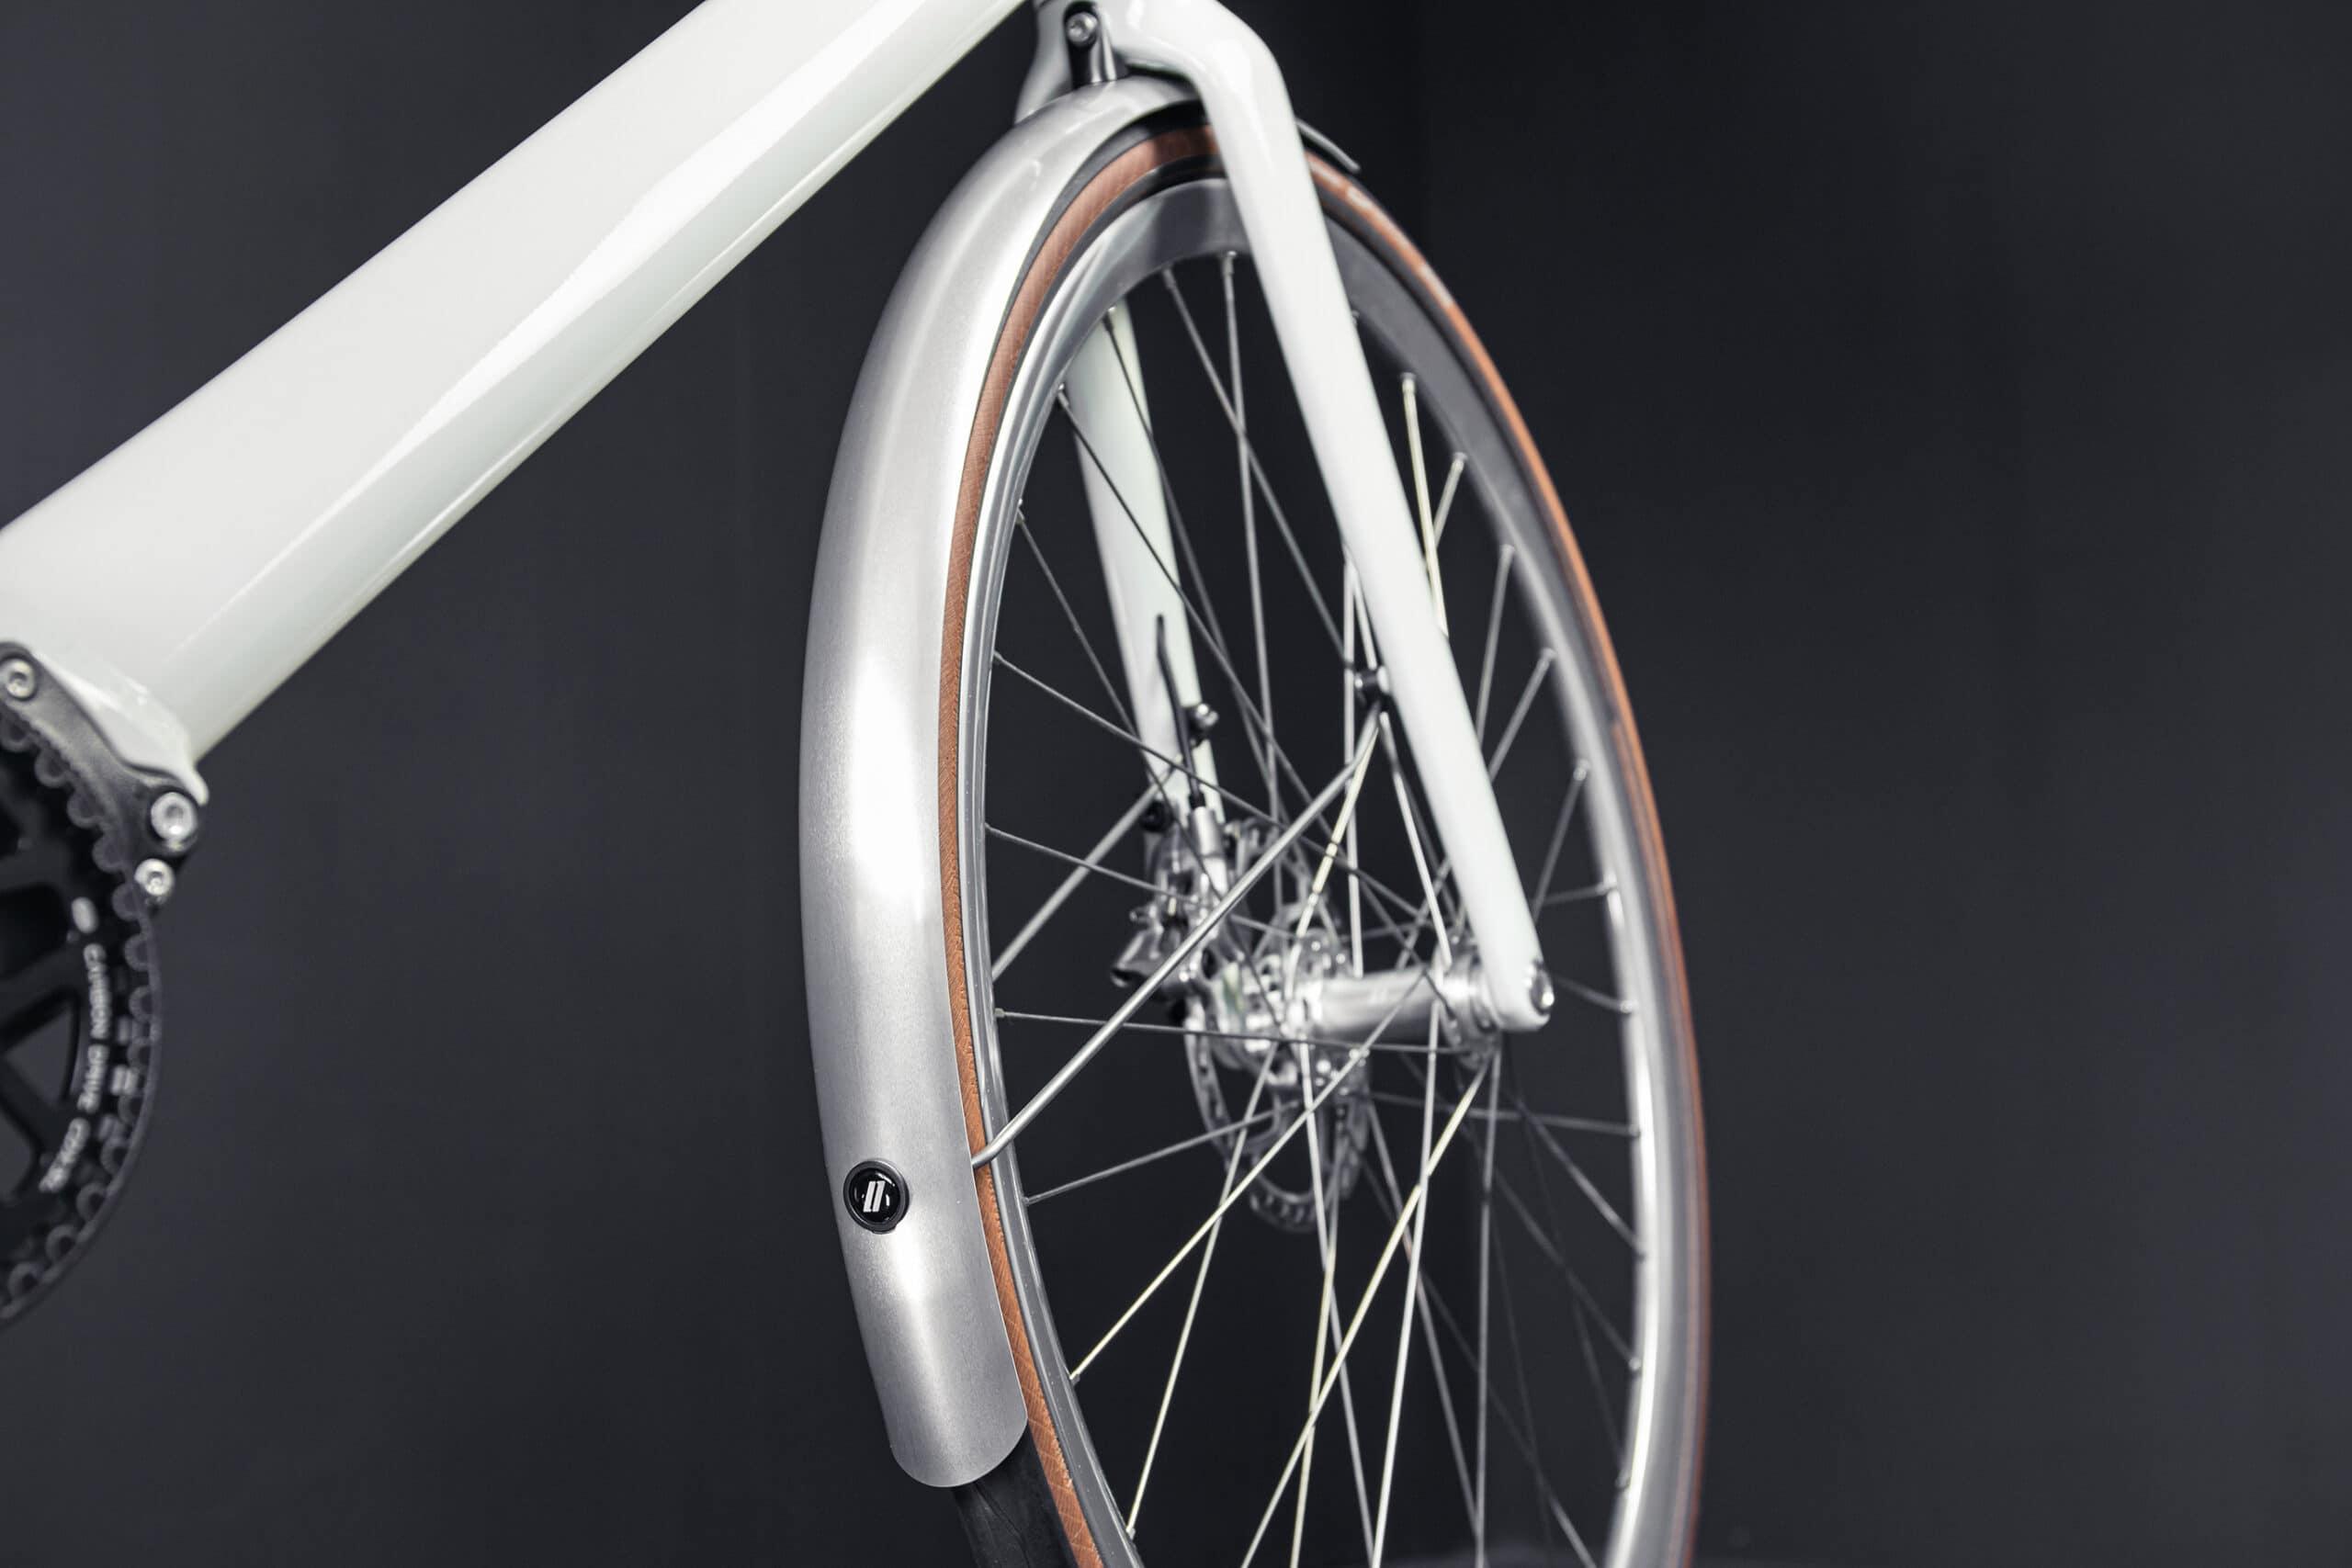 schindelhauer Antonia Pinion e-bike -11